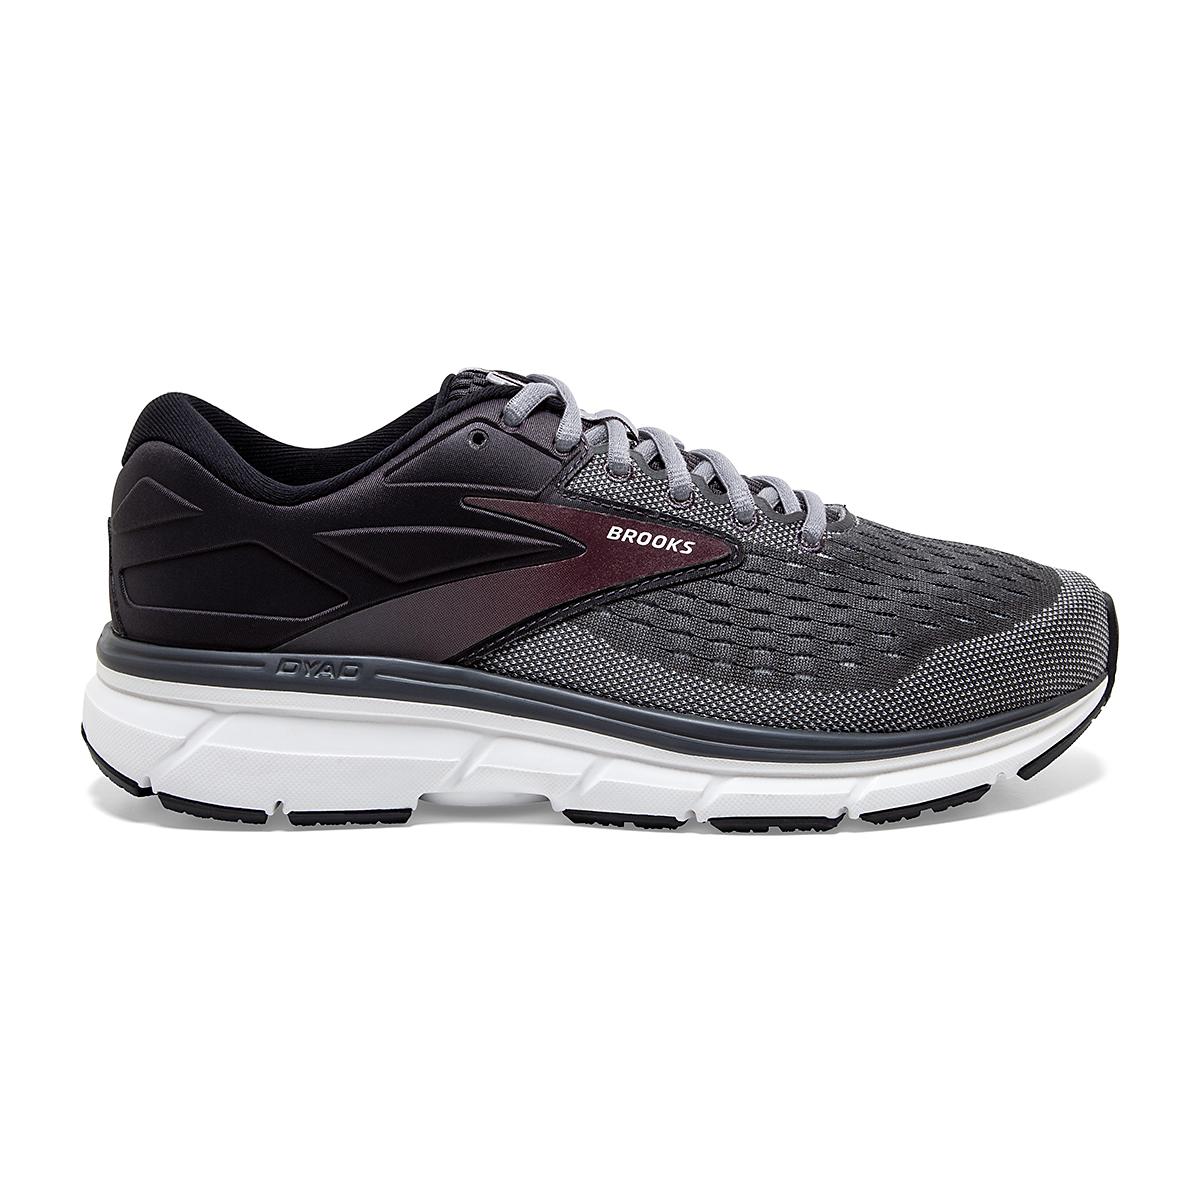 Men's Brooks Dyad 11 Running Shoe - Color: Blackened Pearl  - Size: 7 - Width: Regular, Blackened Pearl, large, image 1